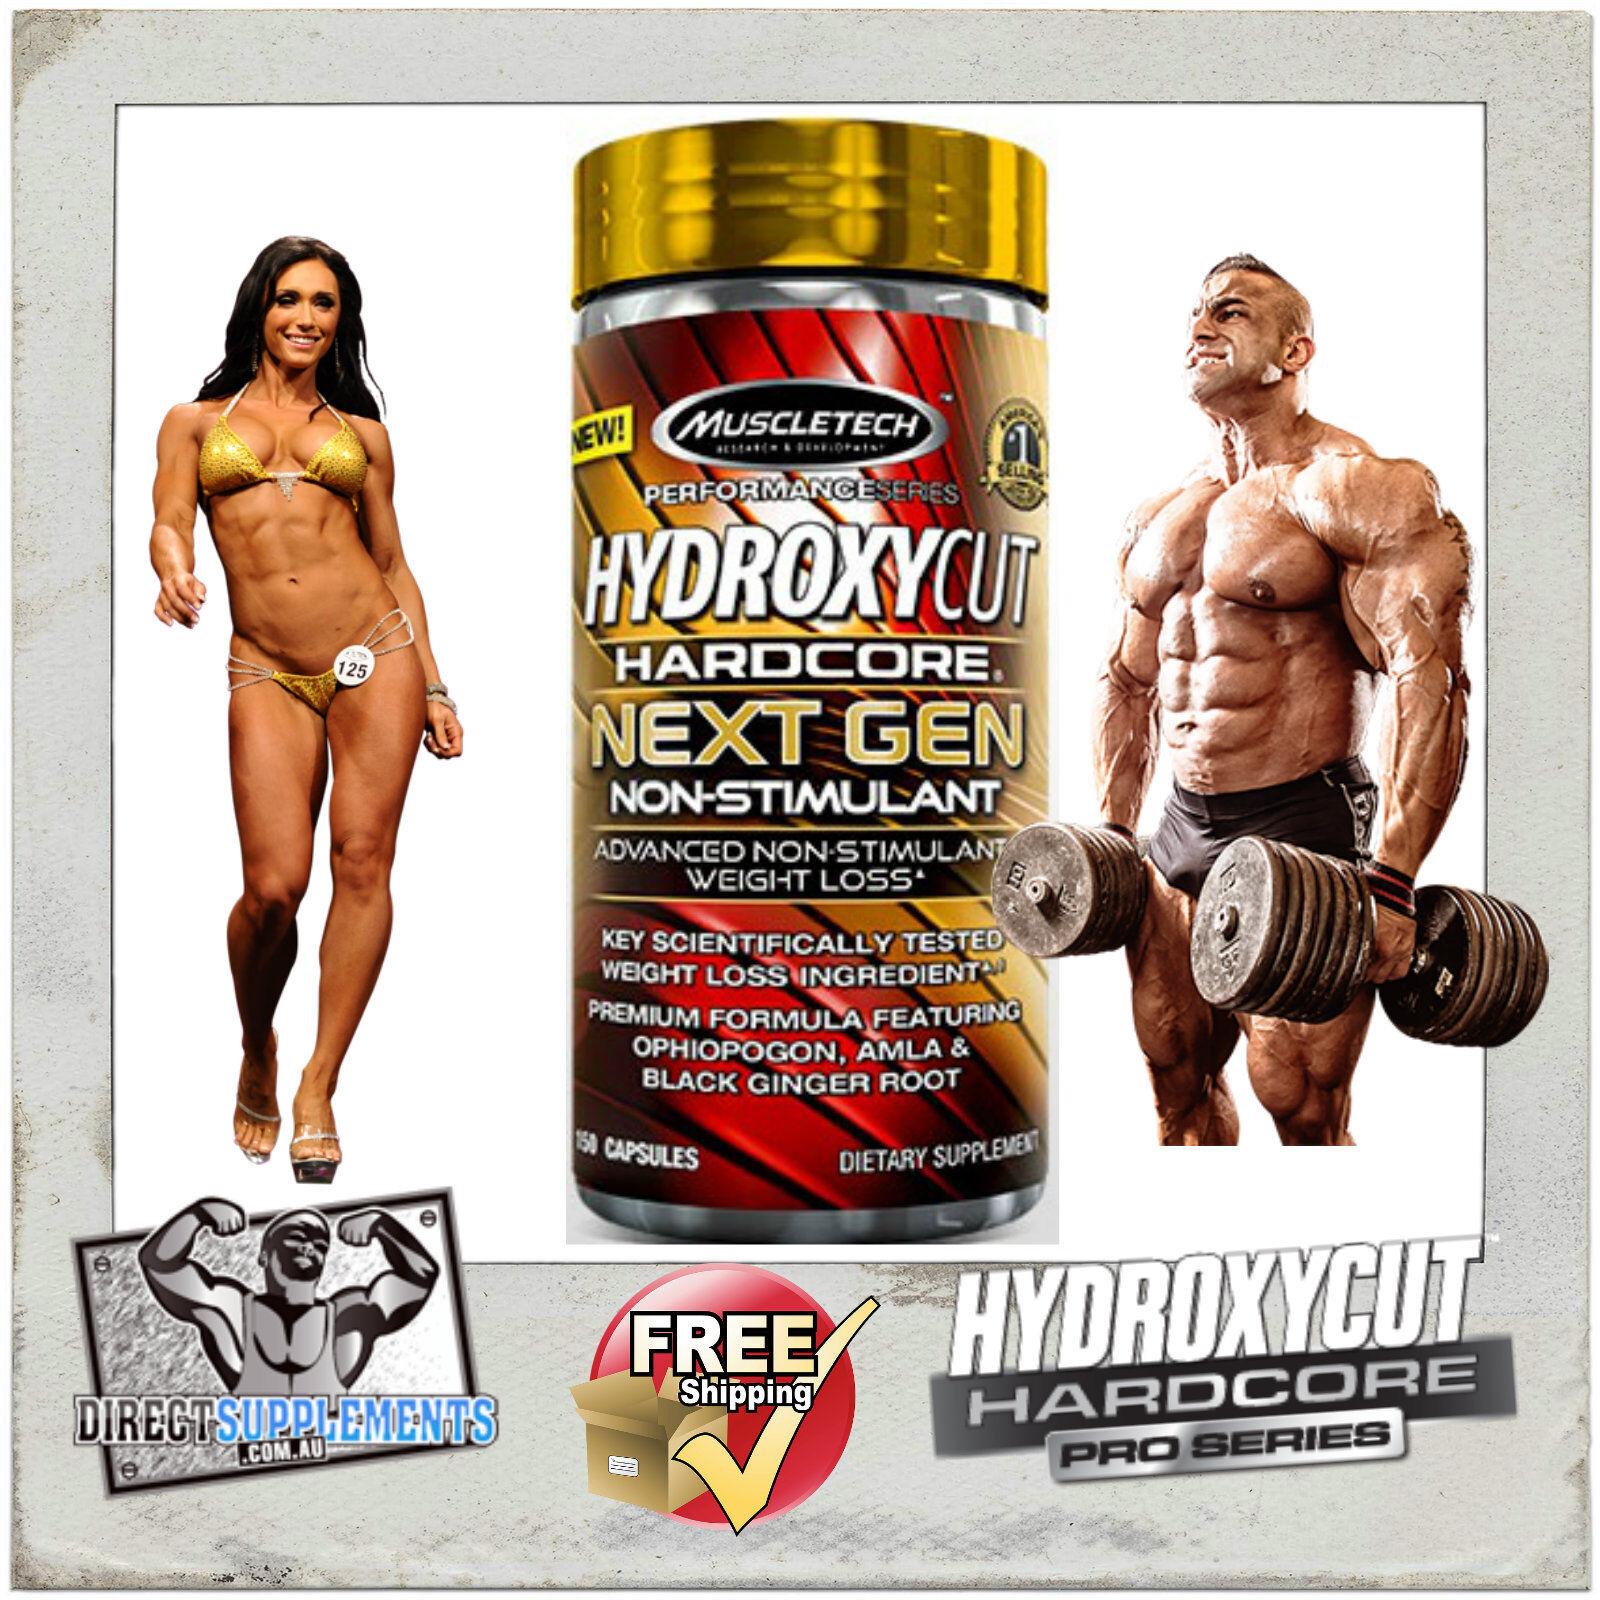 Details About Hydroxycut Hardcore Next Gen Non Stim 150 Capsules Fat Burner Hydroxy Cut